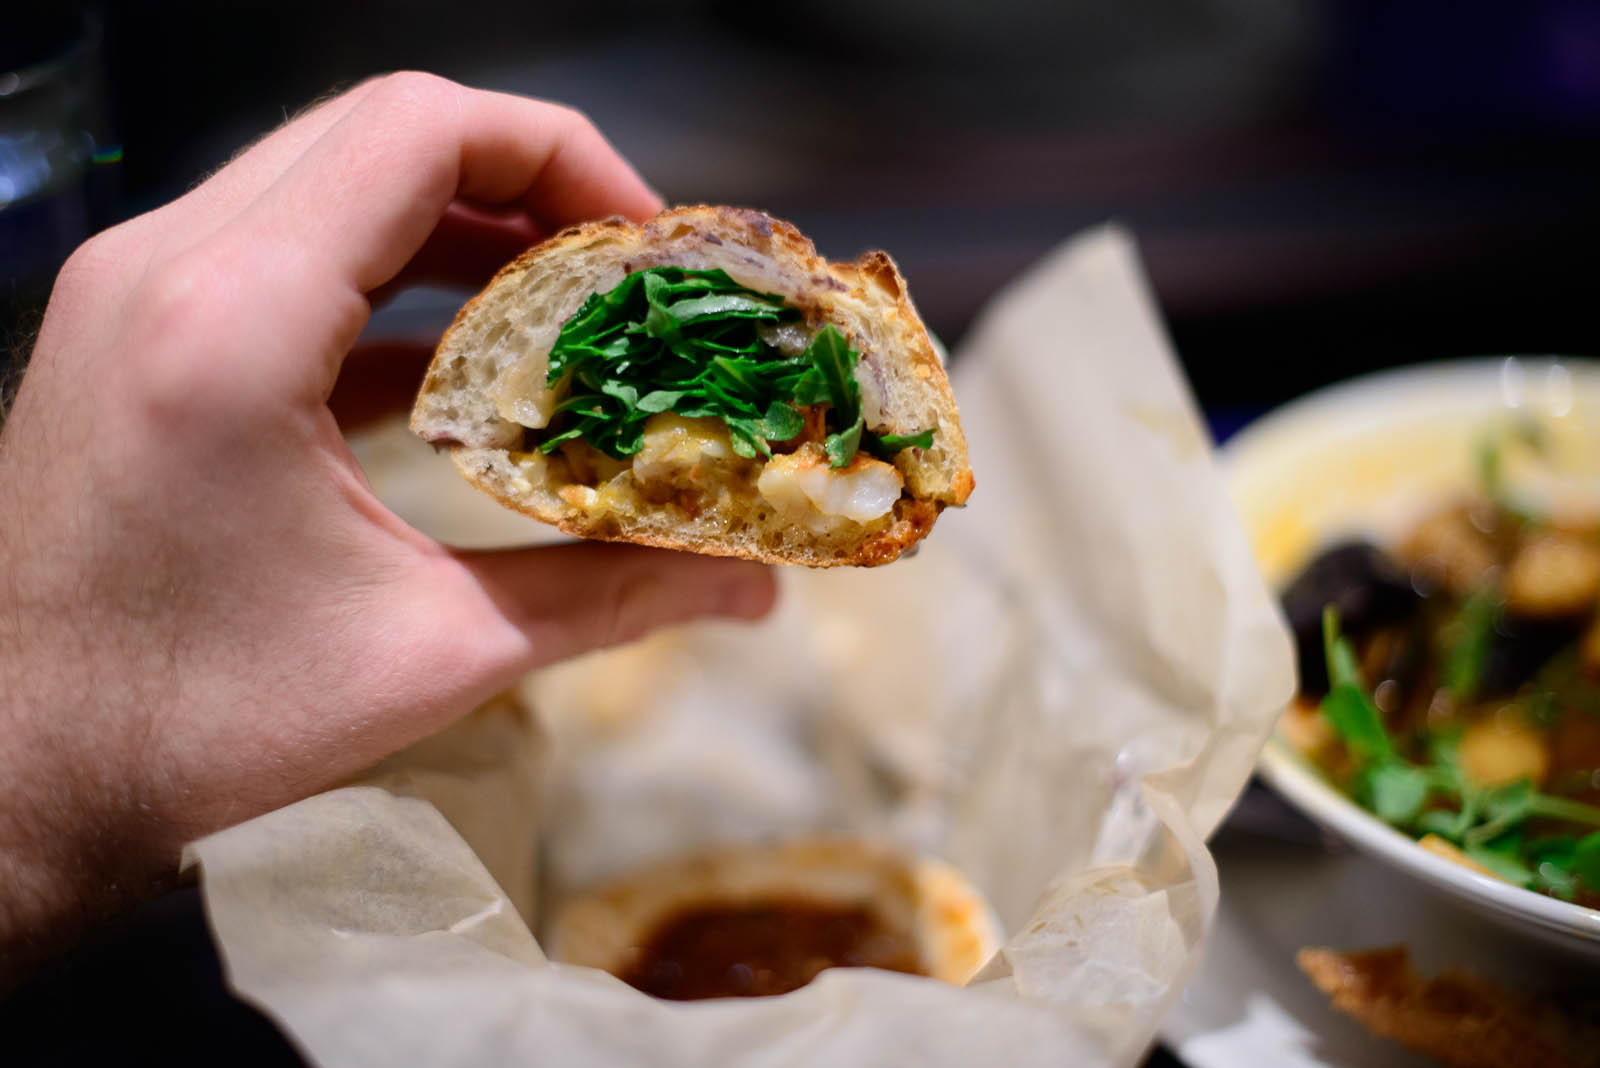 Smoky garlic shrimp torta - Seared shrimp, chipotle-garlic mojo,